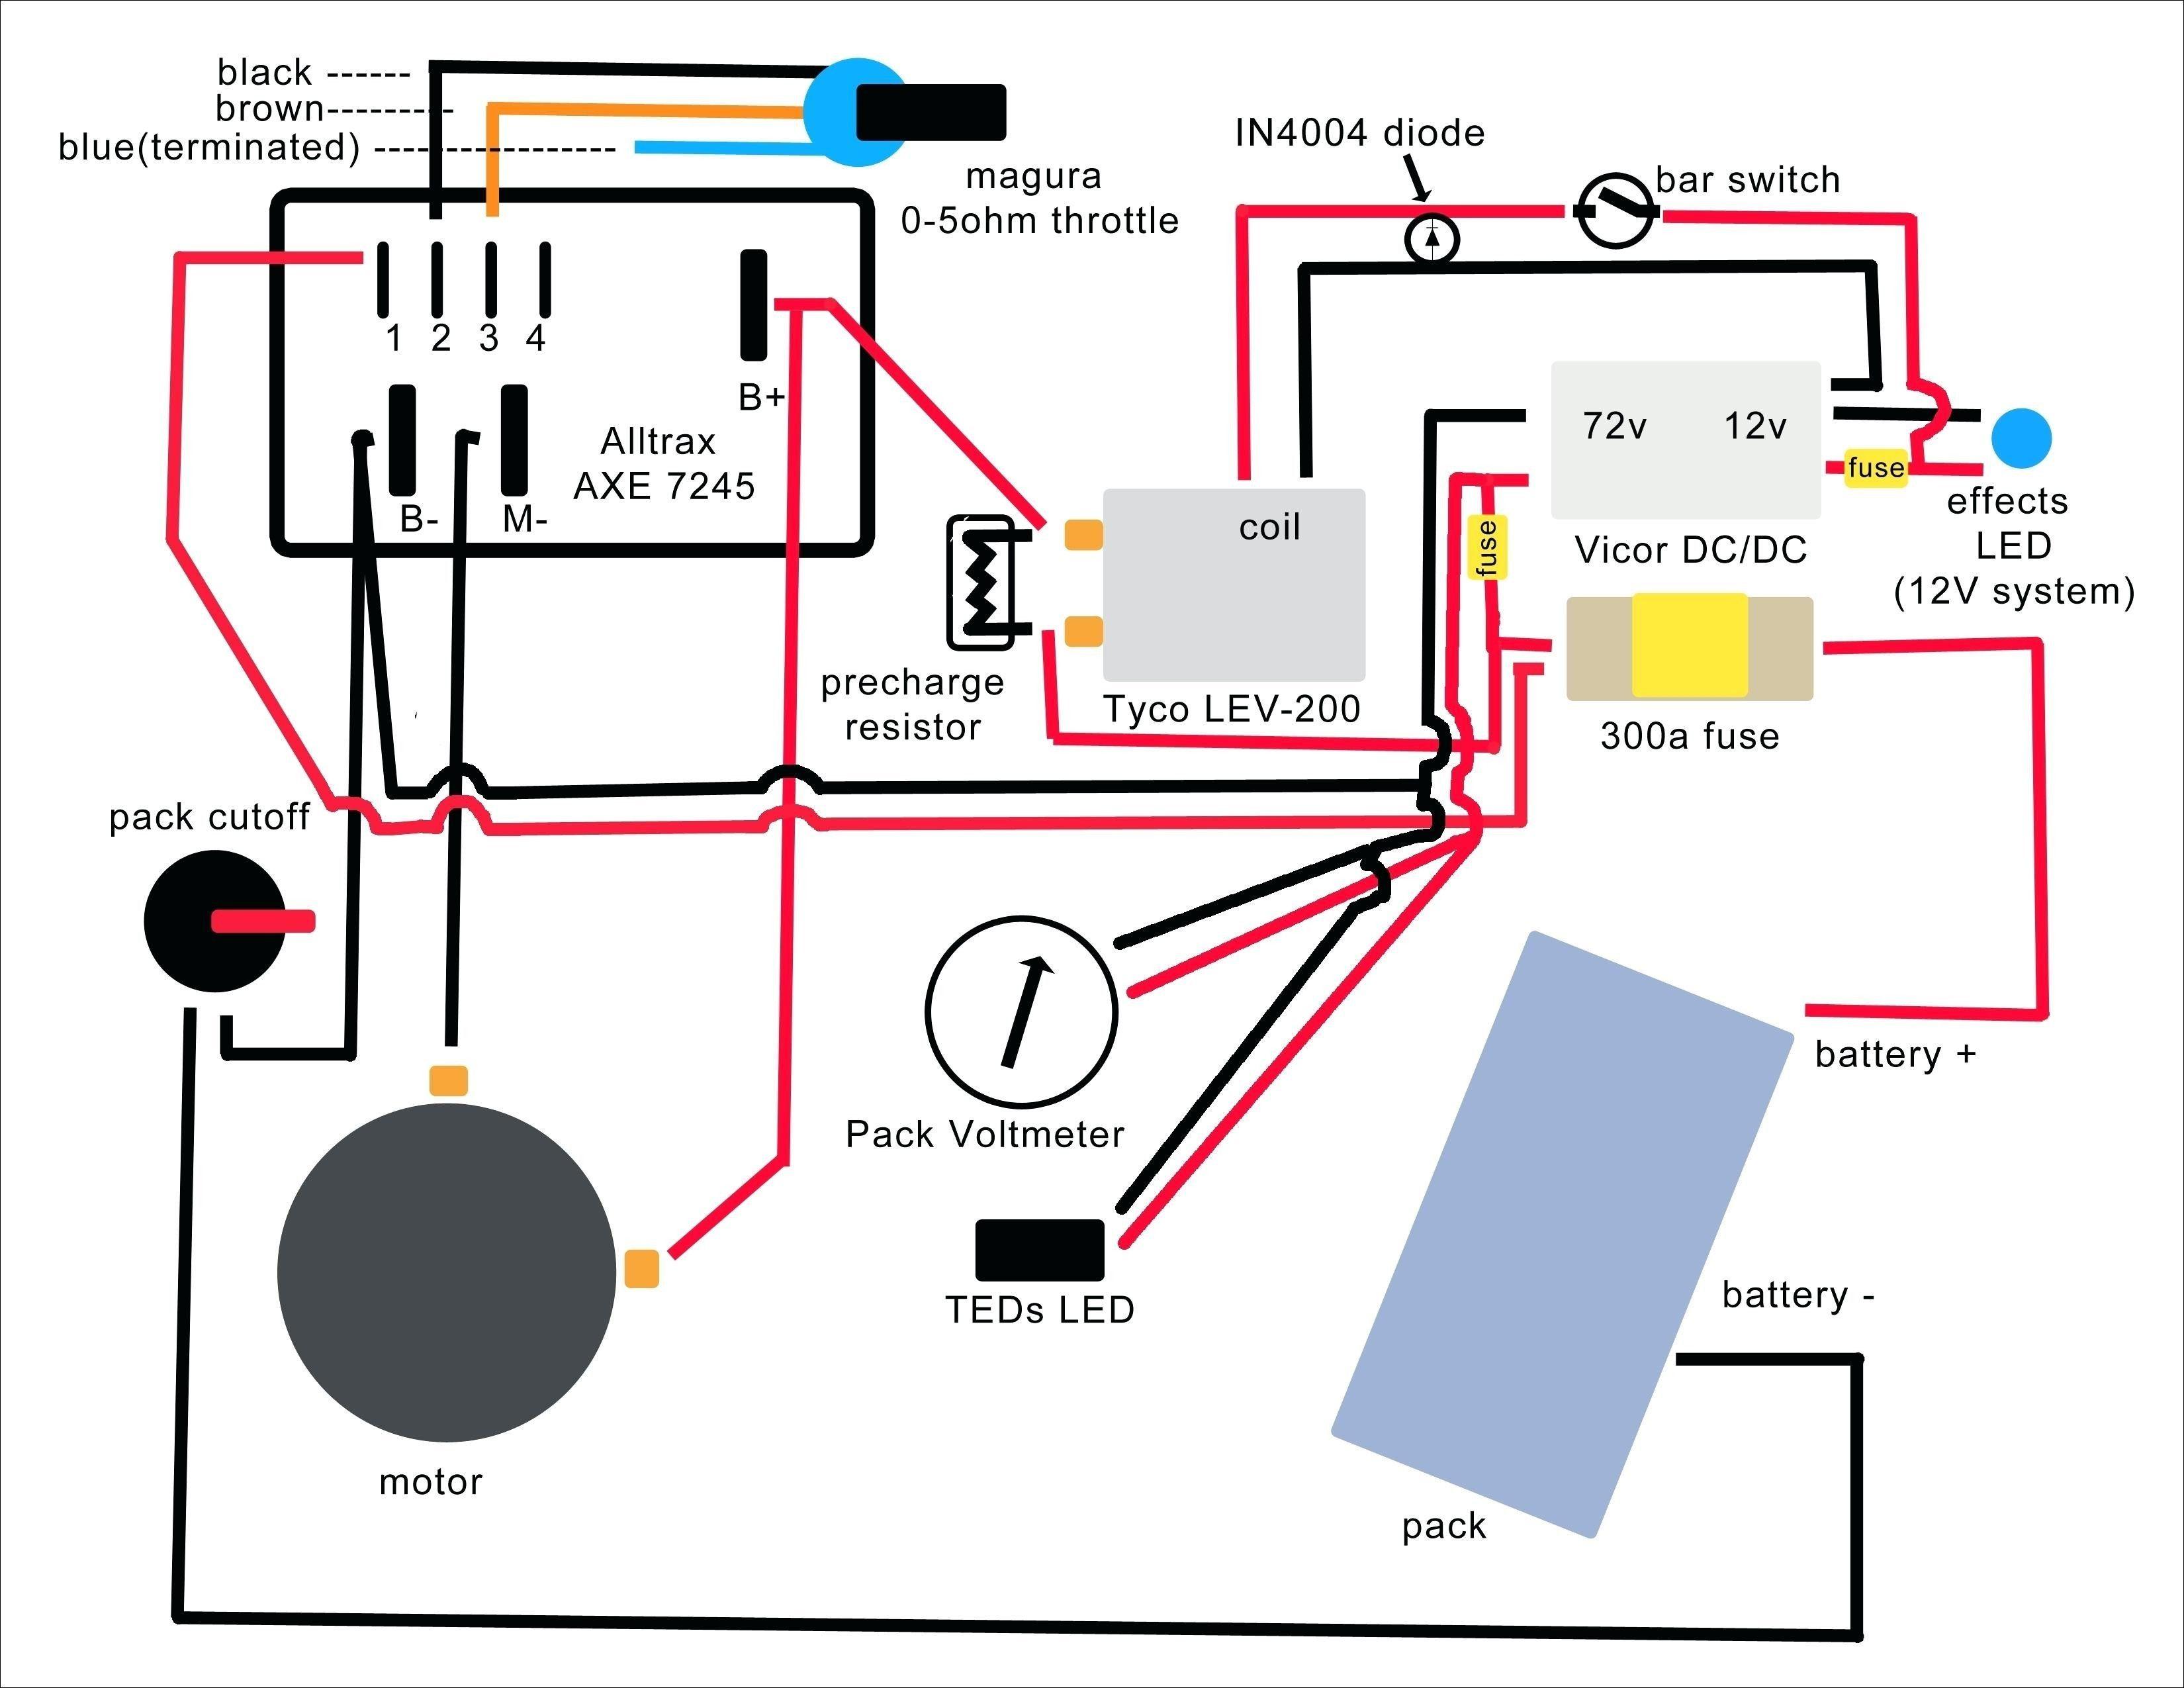 New Doorbell Button Wiring Diagram  Diagram  Diagramsample  Diagramtemplate  Wiringdiagram